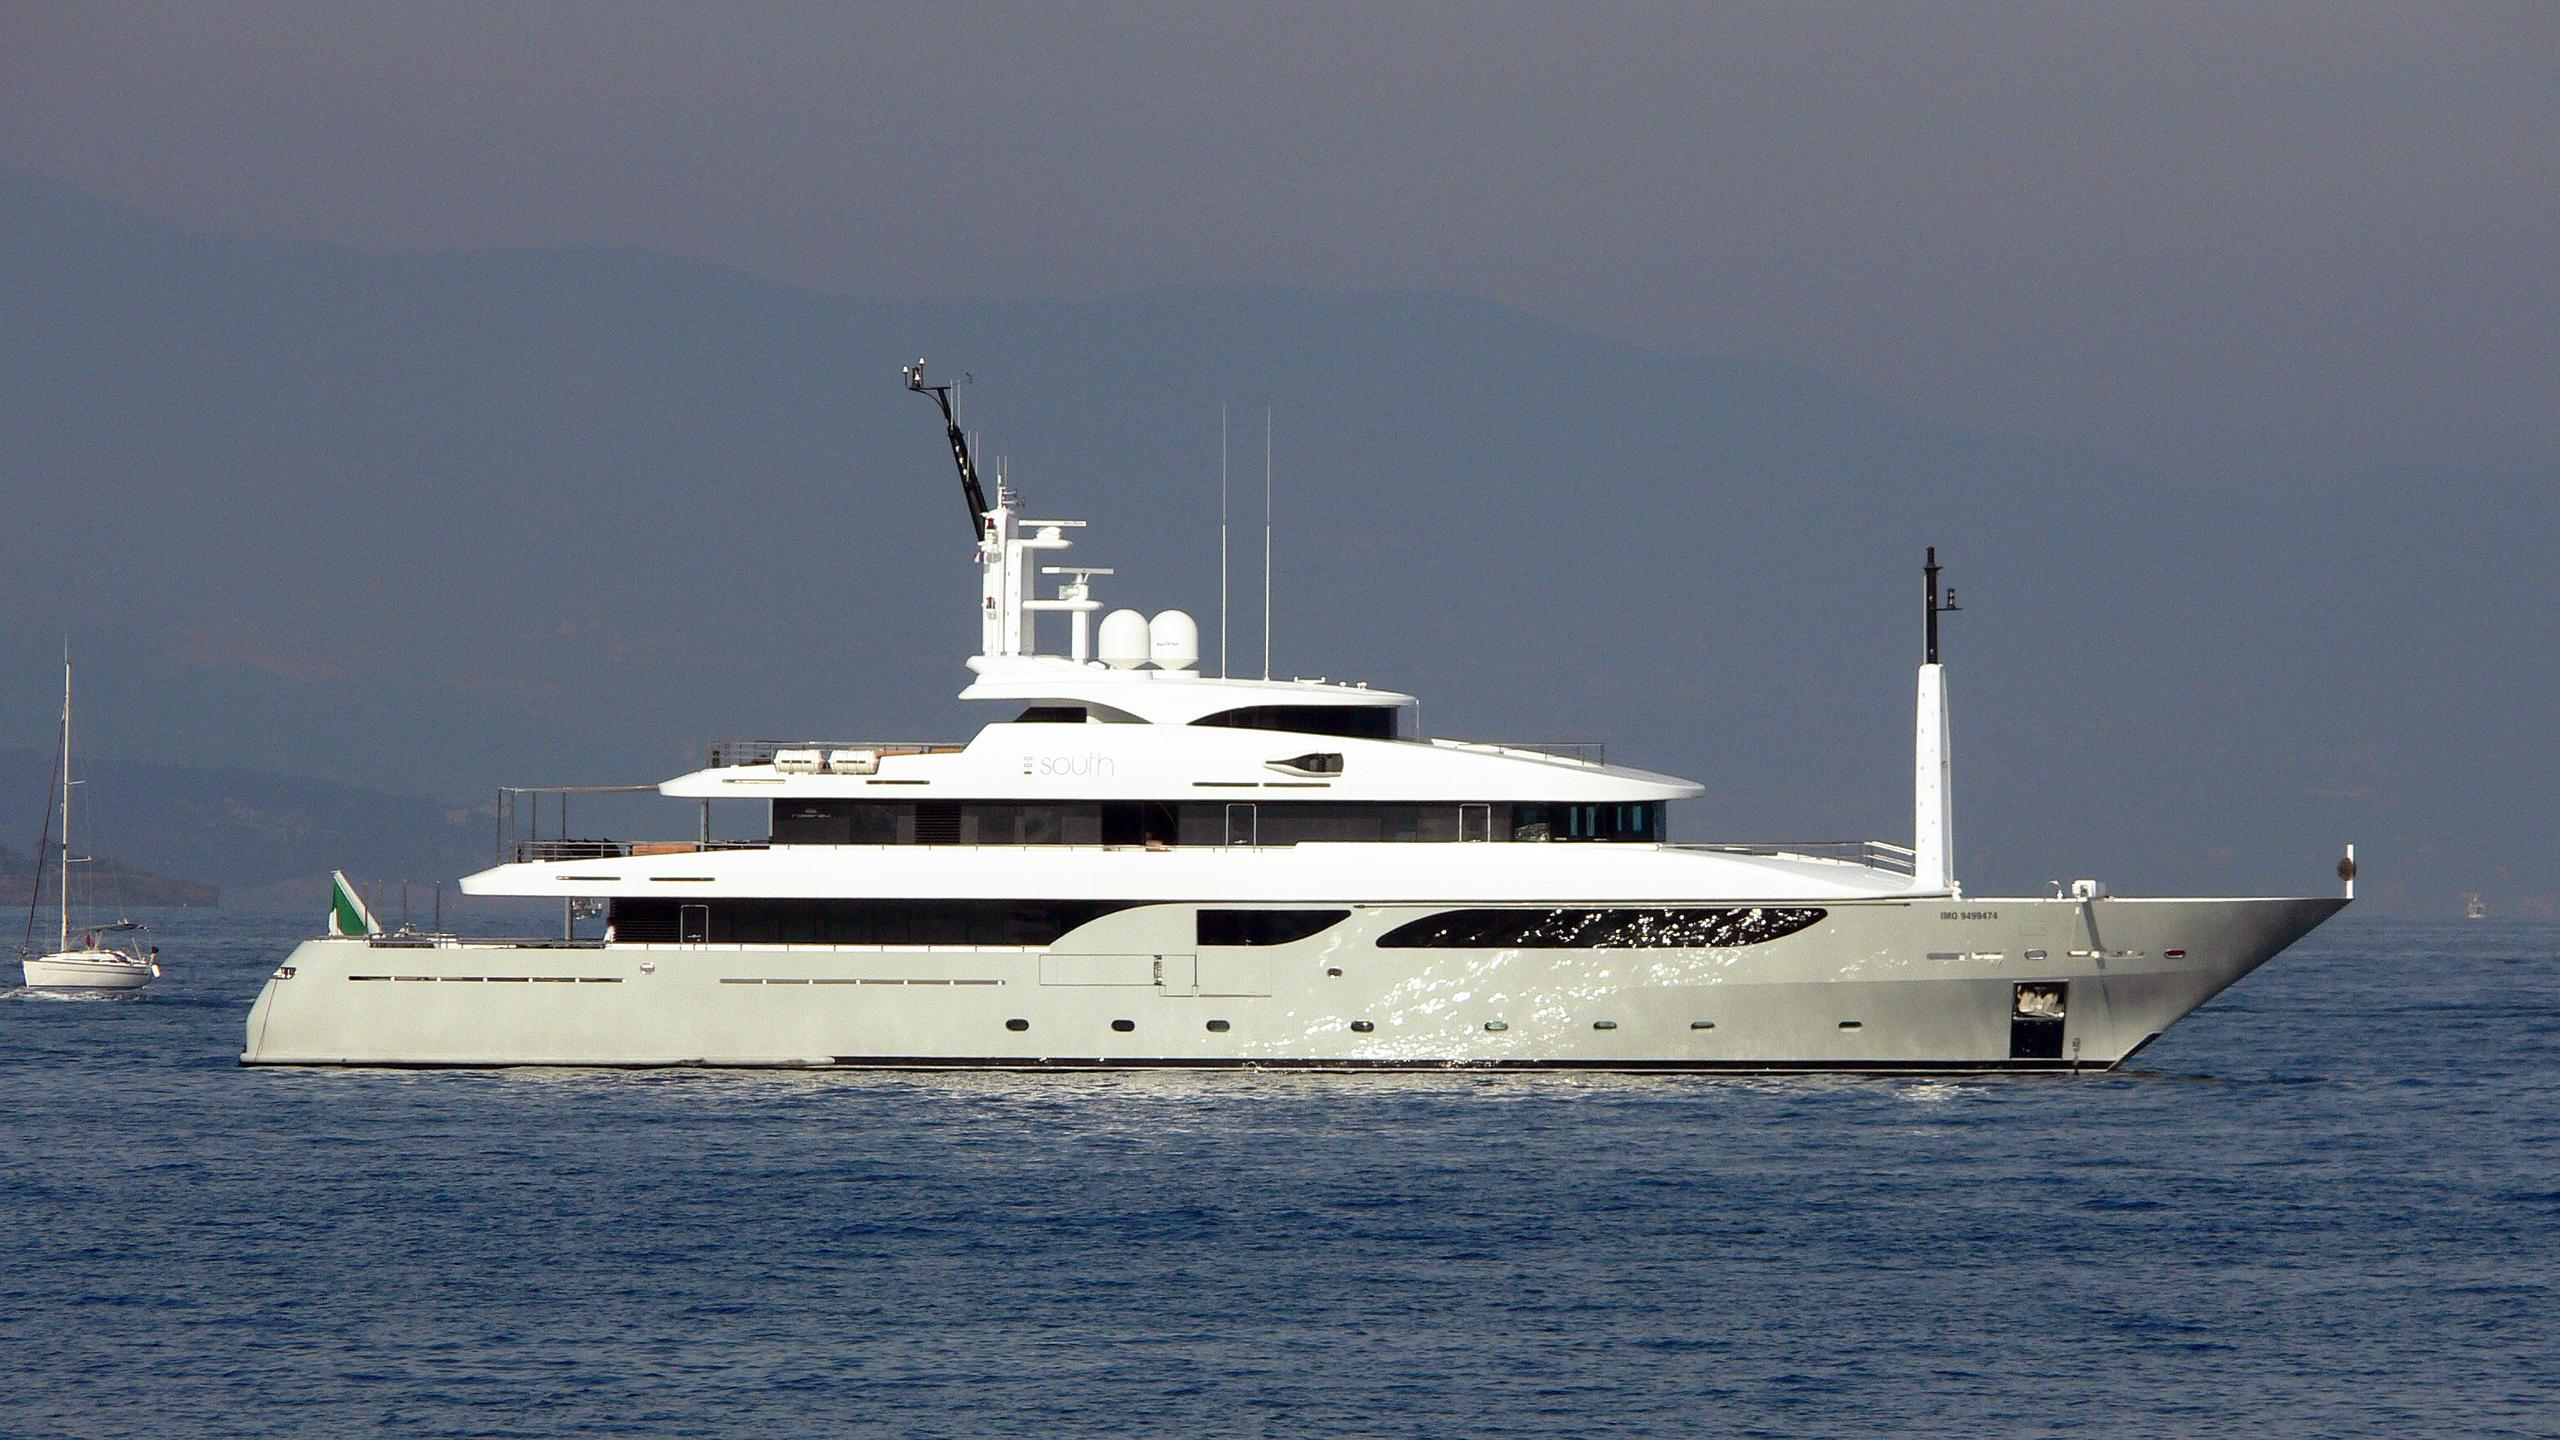 rarity-syna-south-motor-yacht-rossinavi-2008-53m-profile